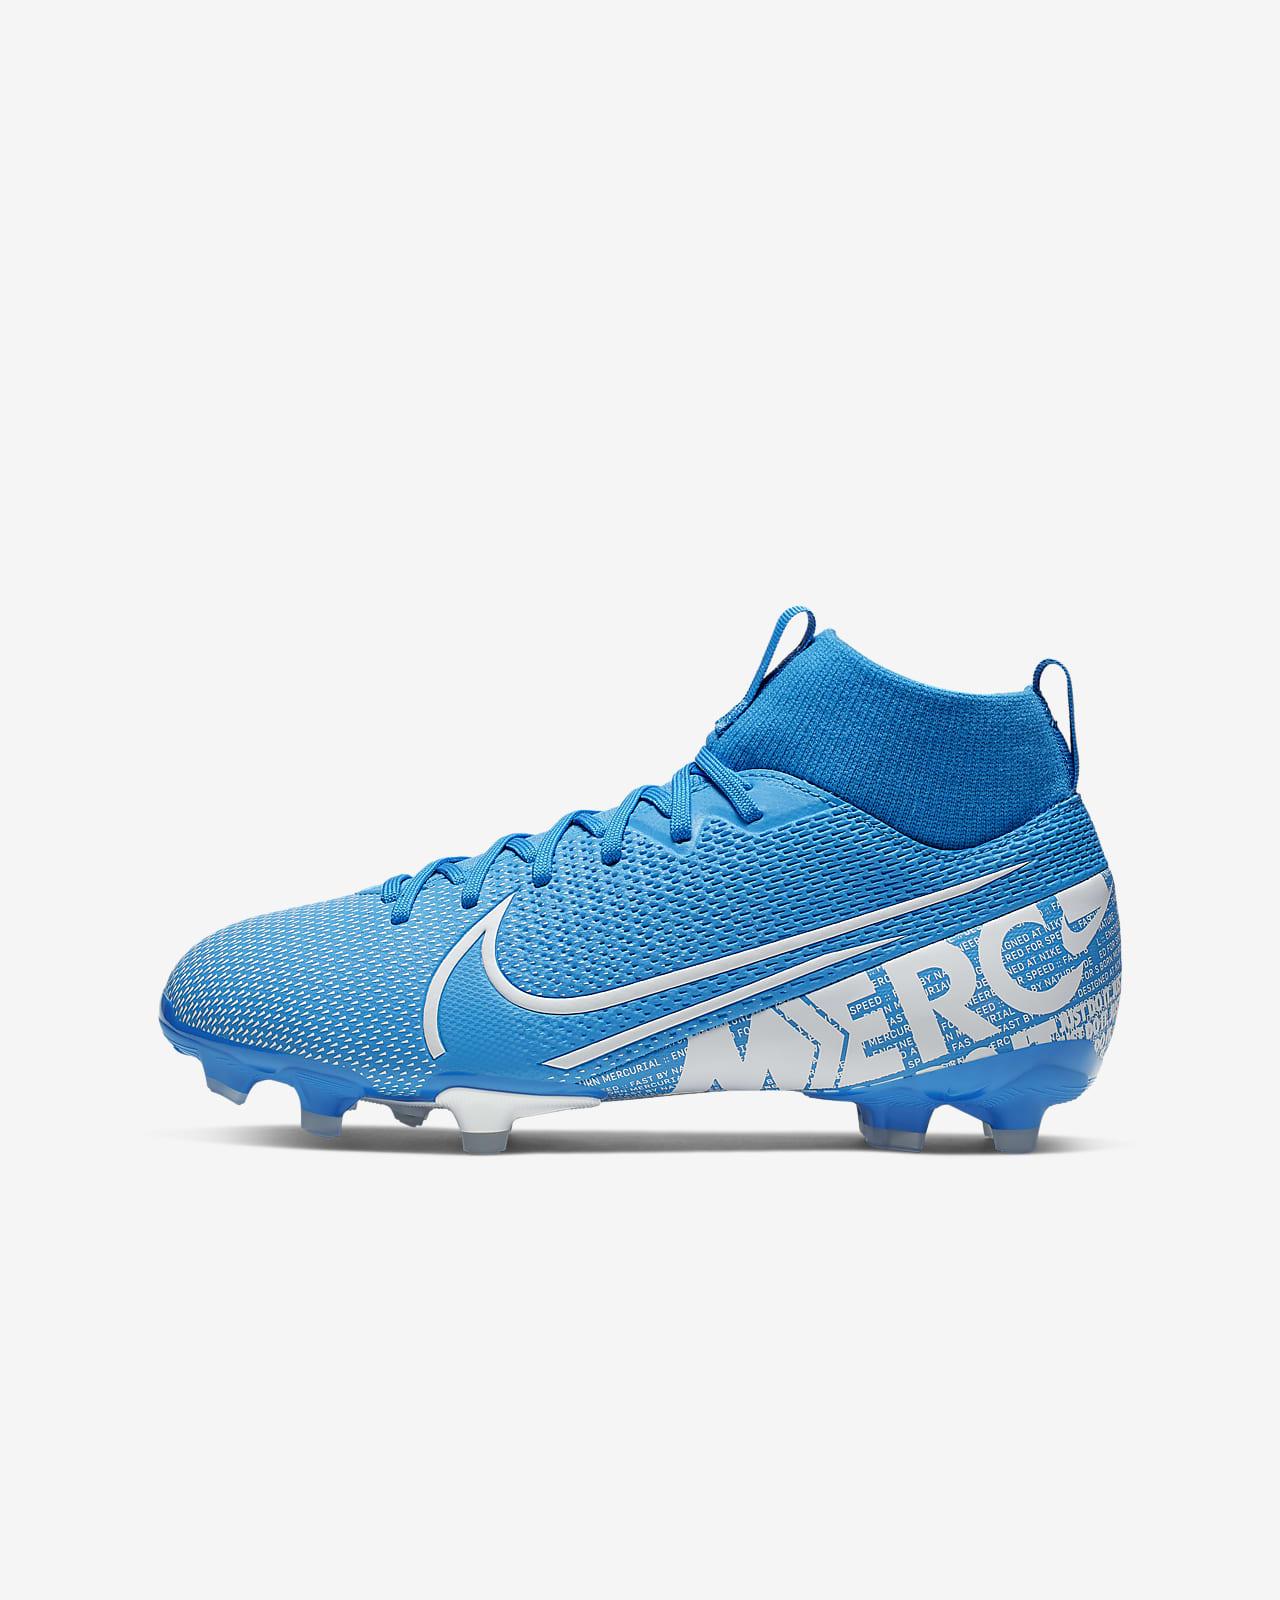 Calzado de fútbol para múltiples superficies para niños Nike Jr. Mercurial Superfly 7 Academy MG